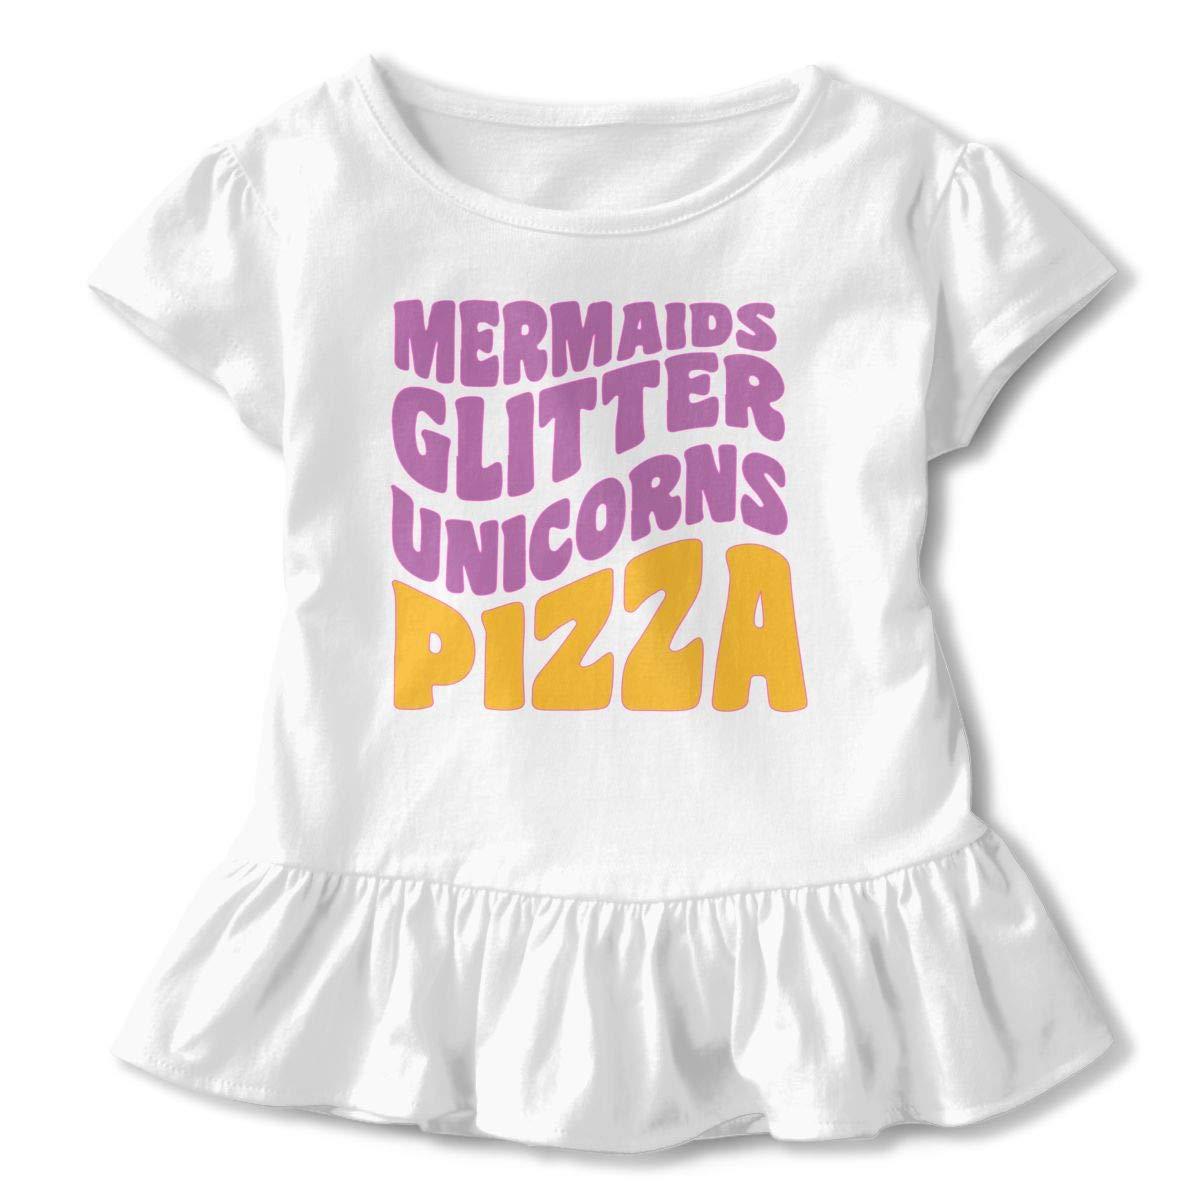 Funny Mermaids Baby Girls Crew Neck Tshirts Top/&Tee